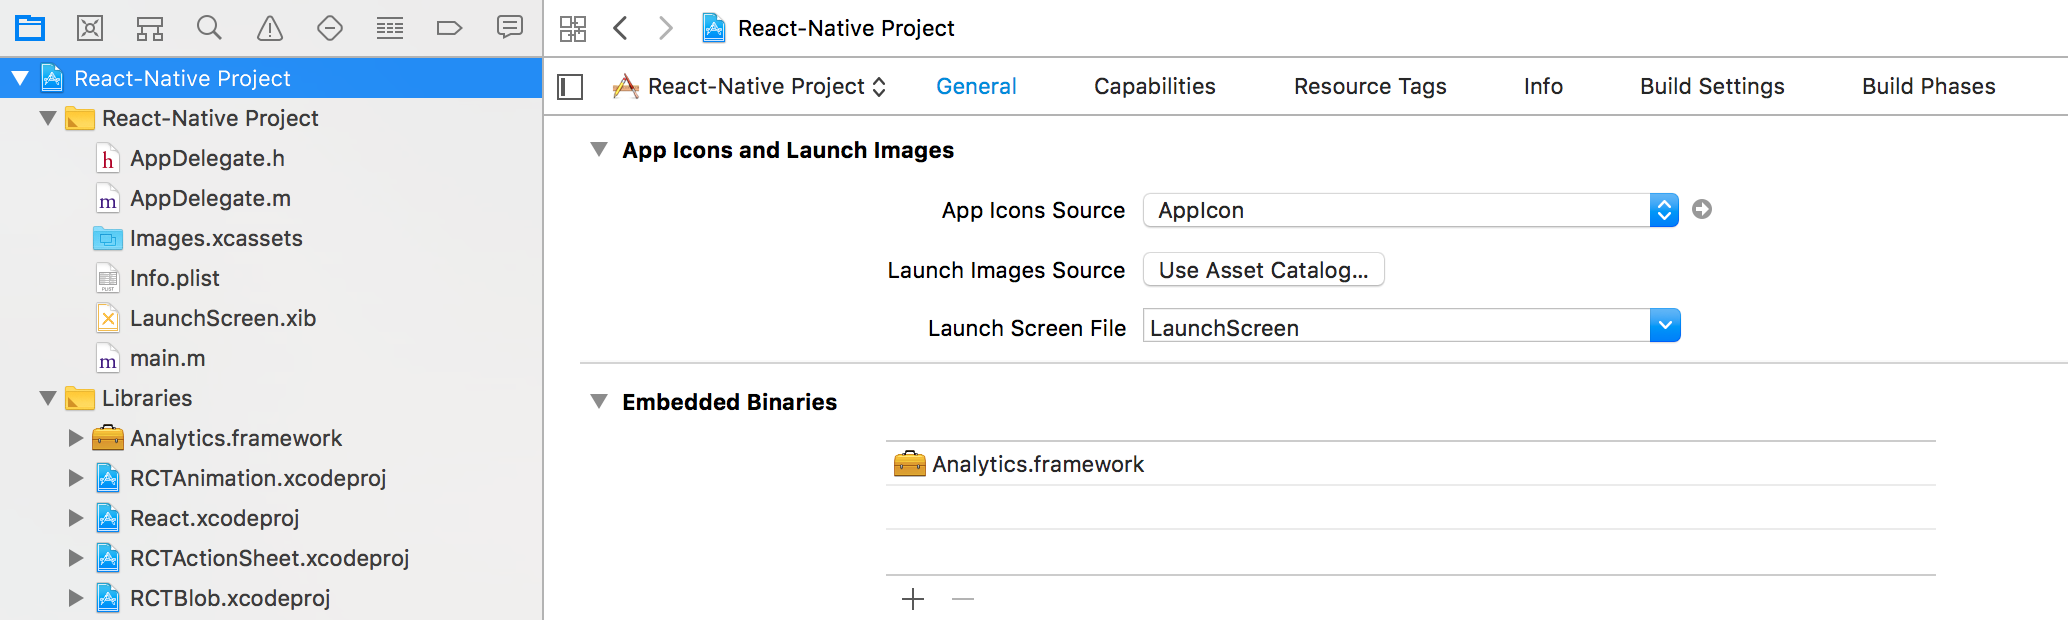 Analytics for React Native | Segment Documentation